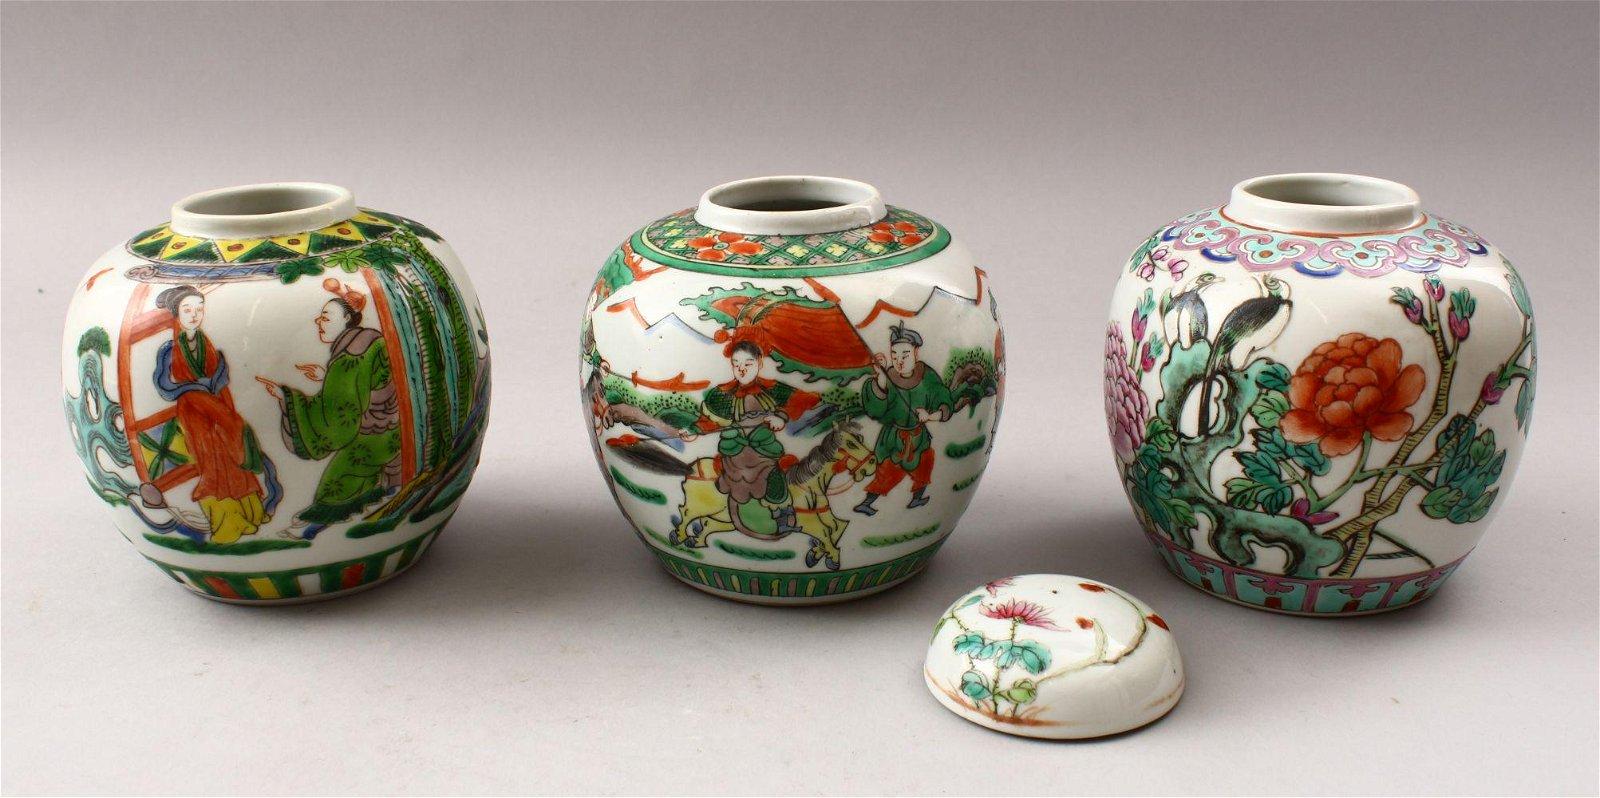 THREE 19TH CENTURY CHINESE FAMILLE ROSE / FAMILLE VERTE